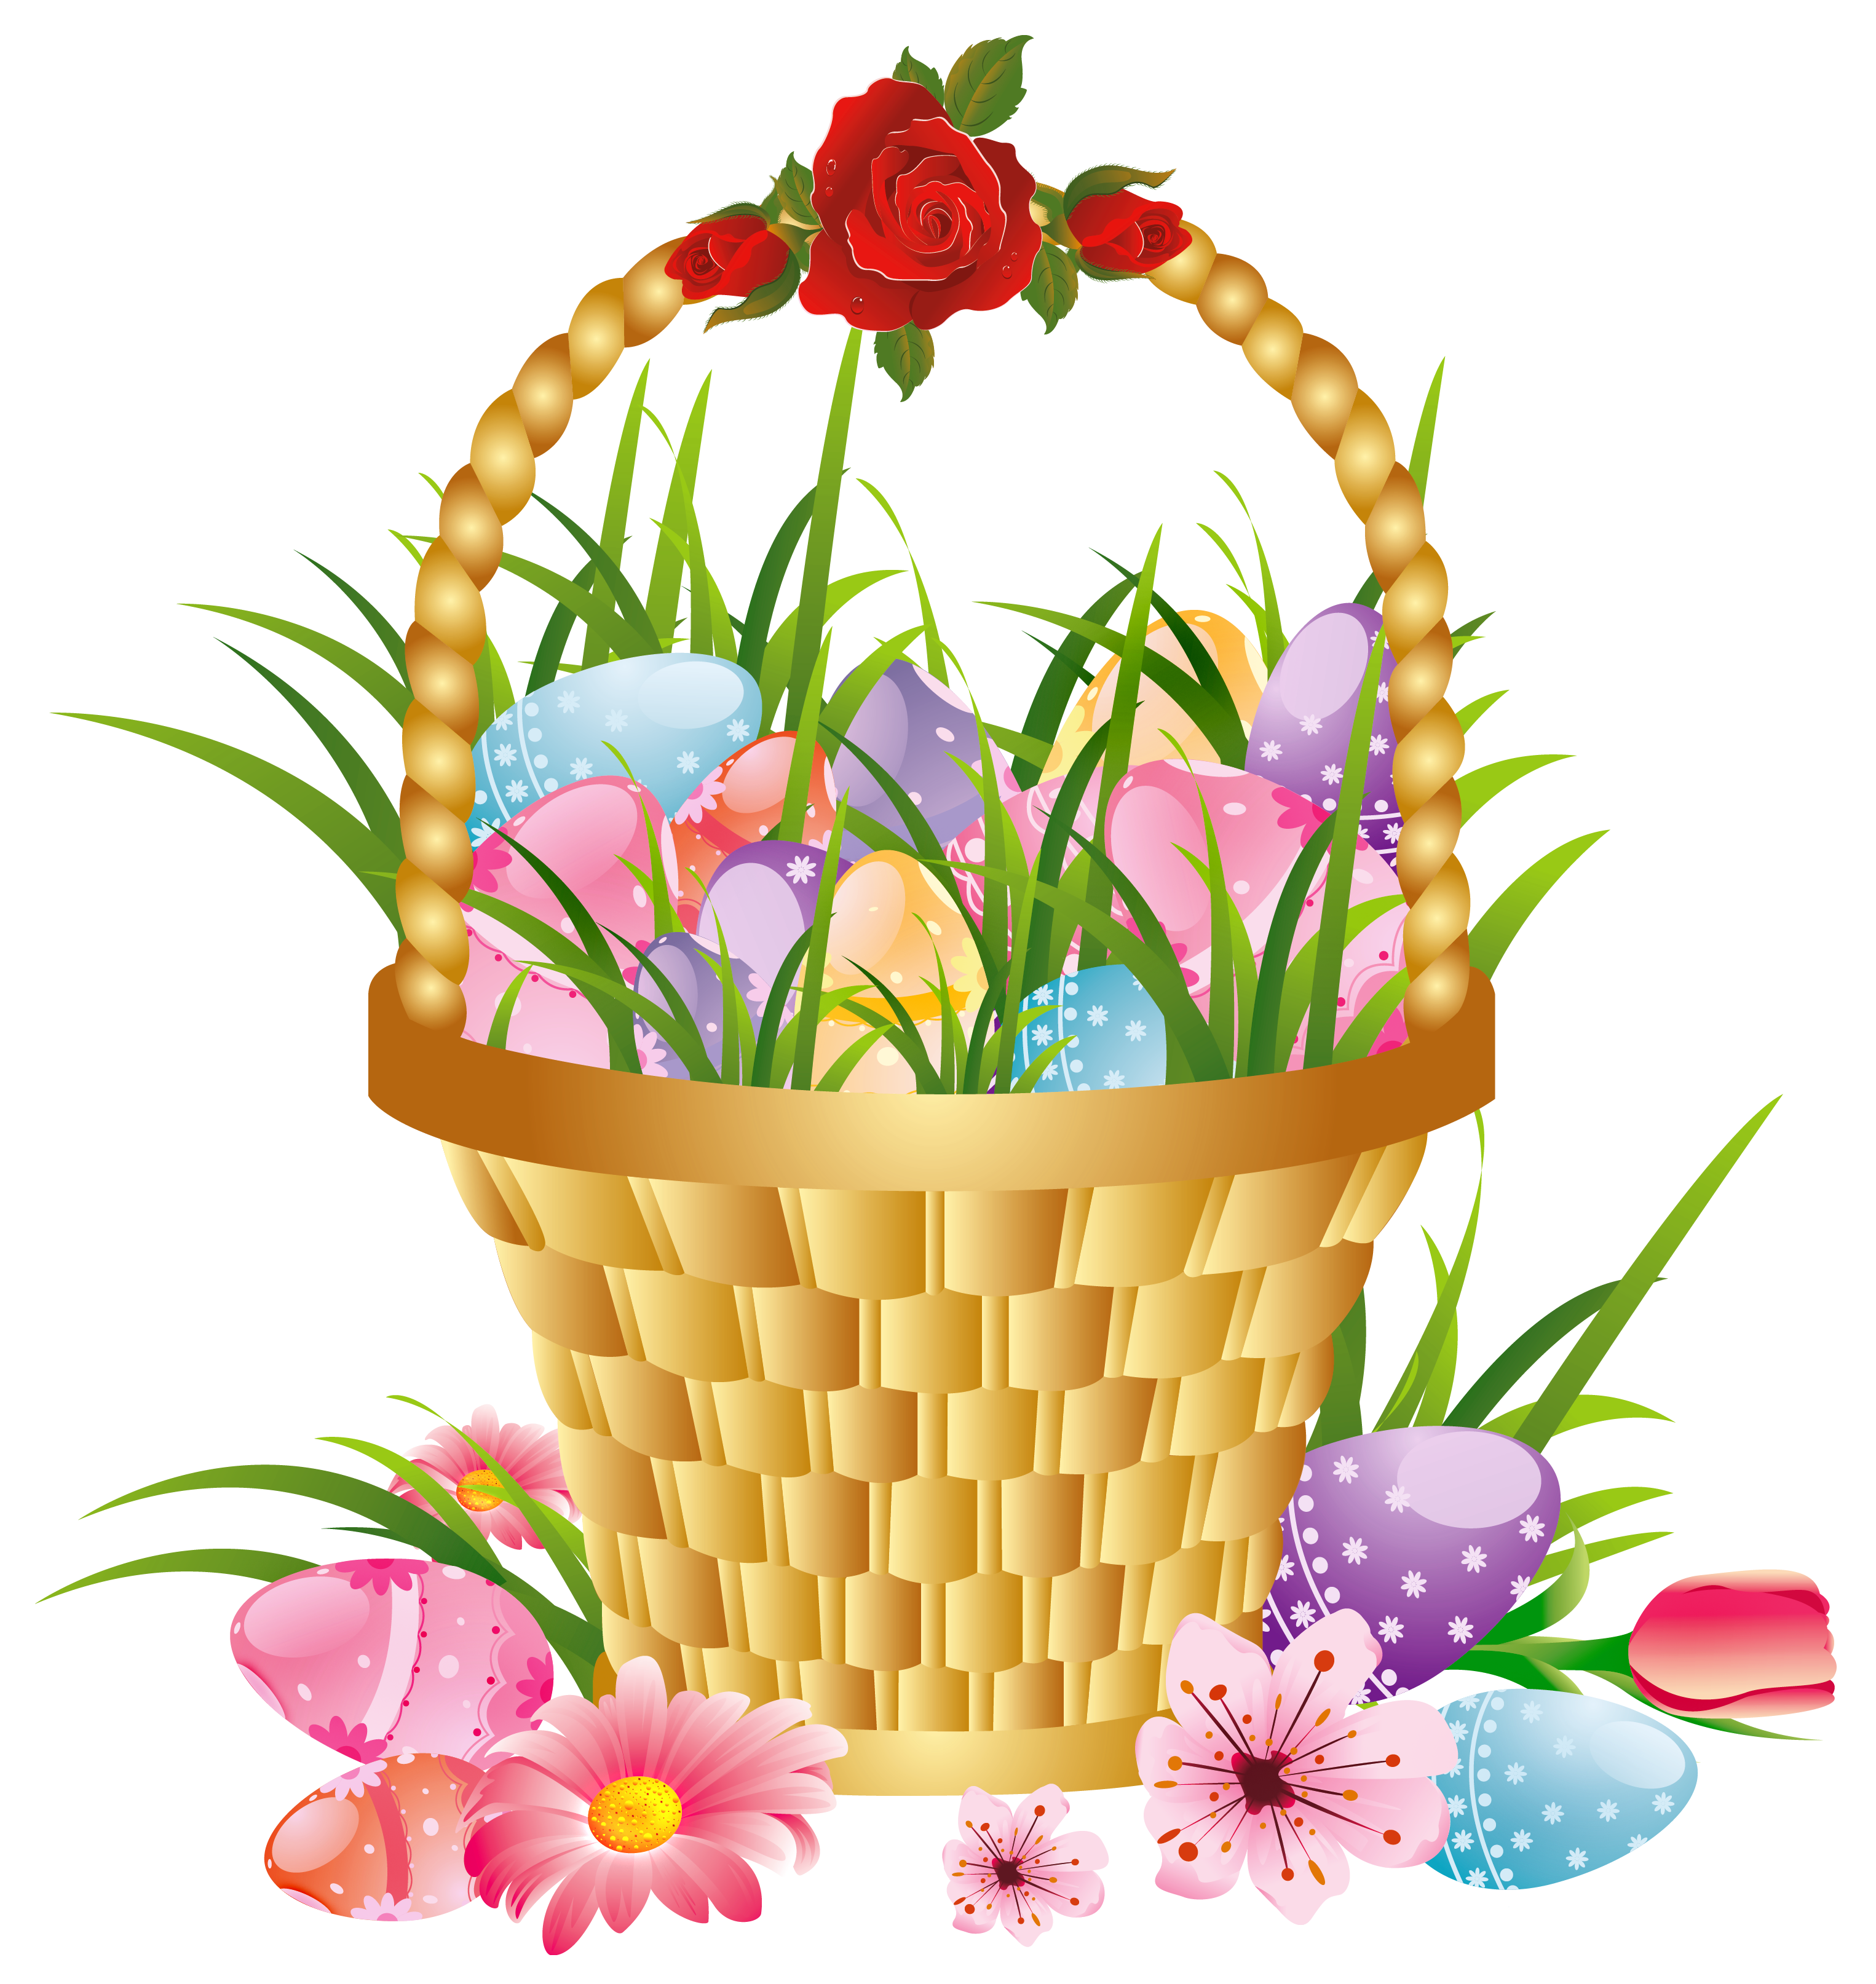 Download PNG image - Easter Basket Bunny Png Hd - Gift Basket PNG HD